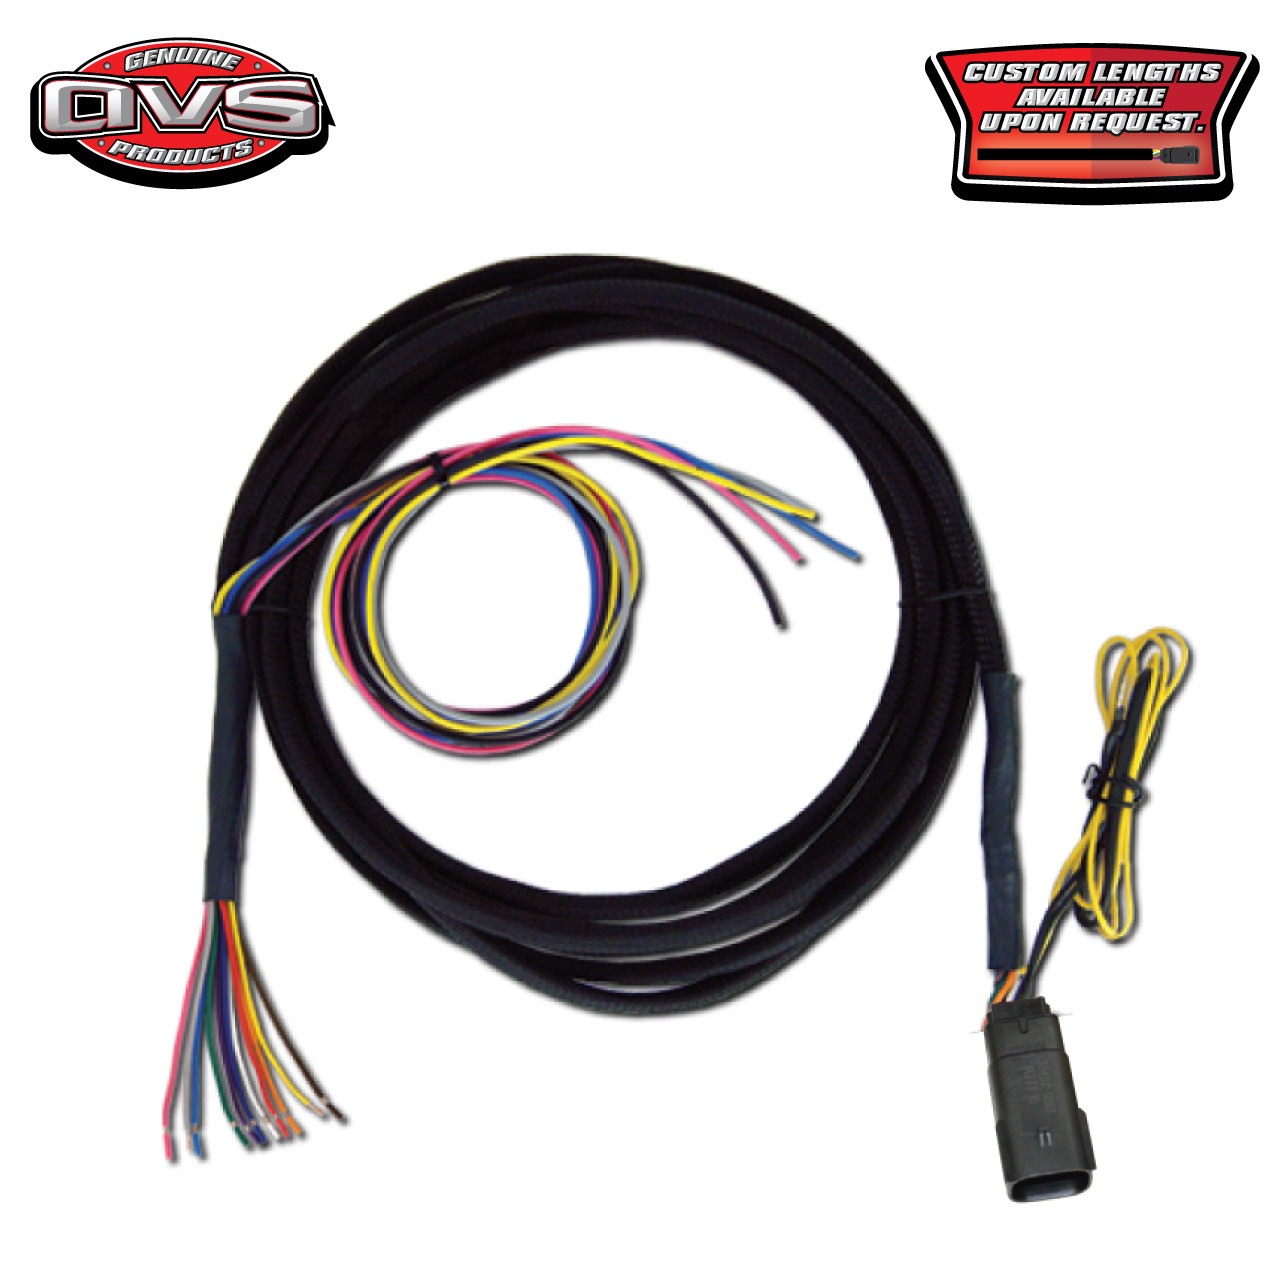 avs valve wiring harness 10 15 20 accuair vx4 valve [ 1280 x 1280 Pixel ]